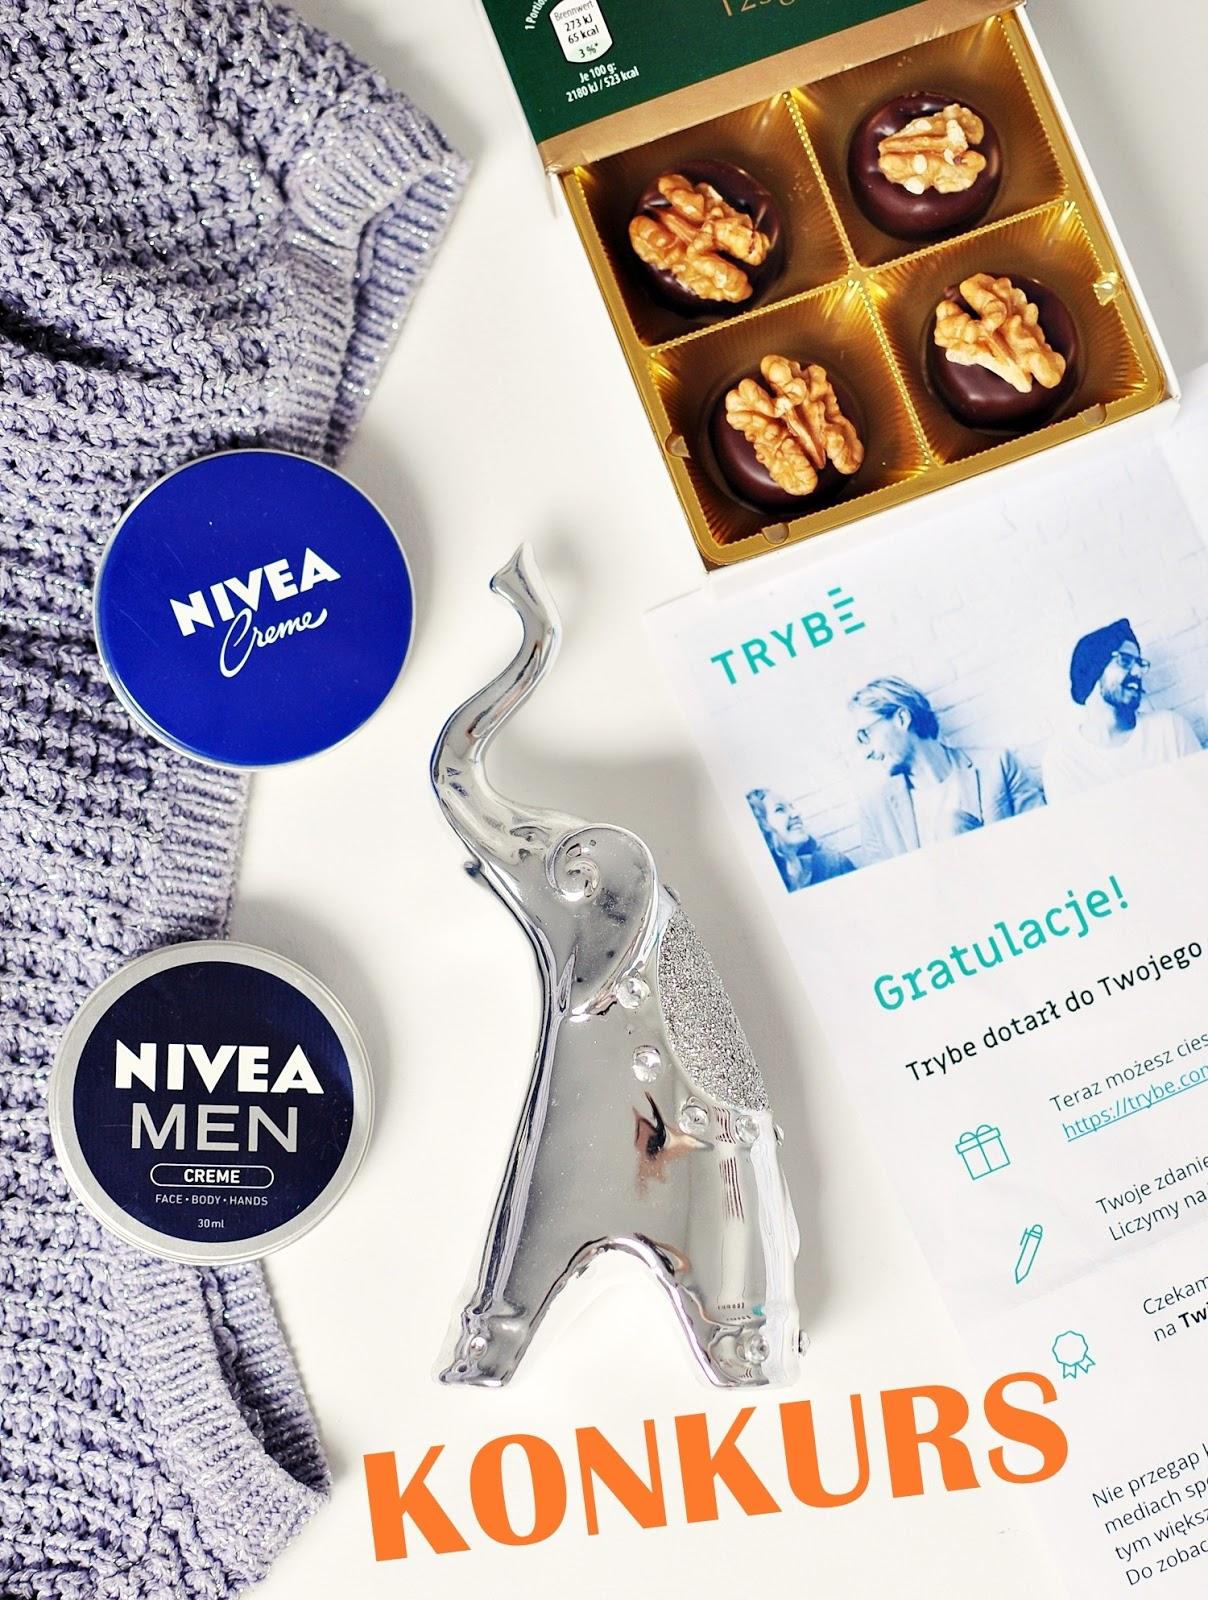 konkurs-Nivea-wygraj-kosmetyki